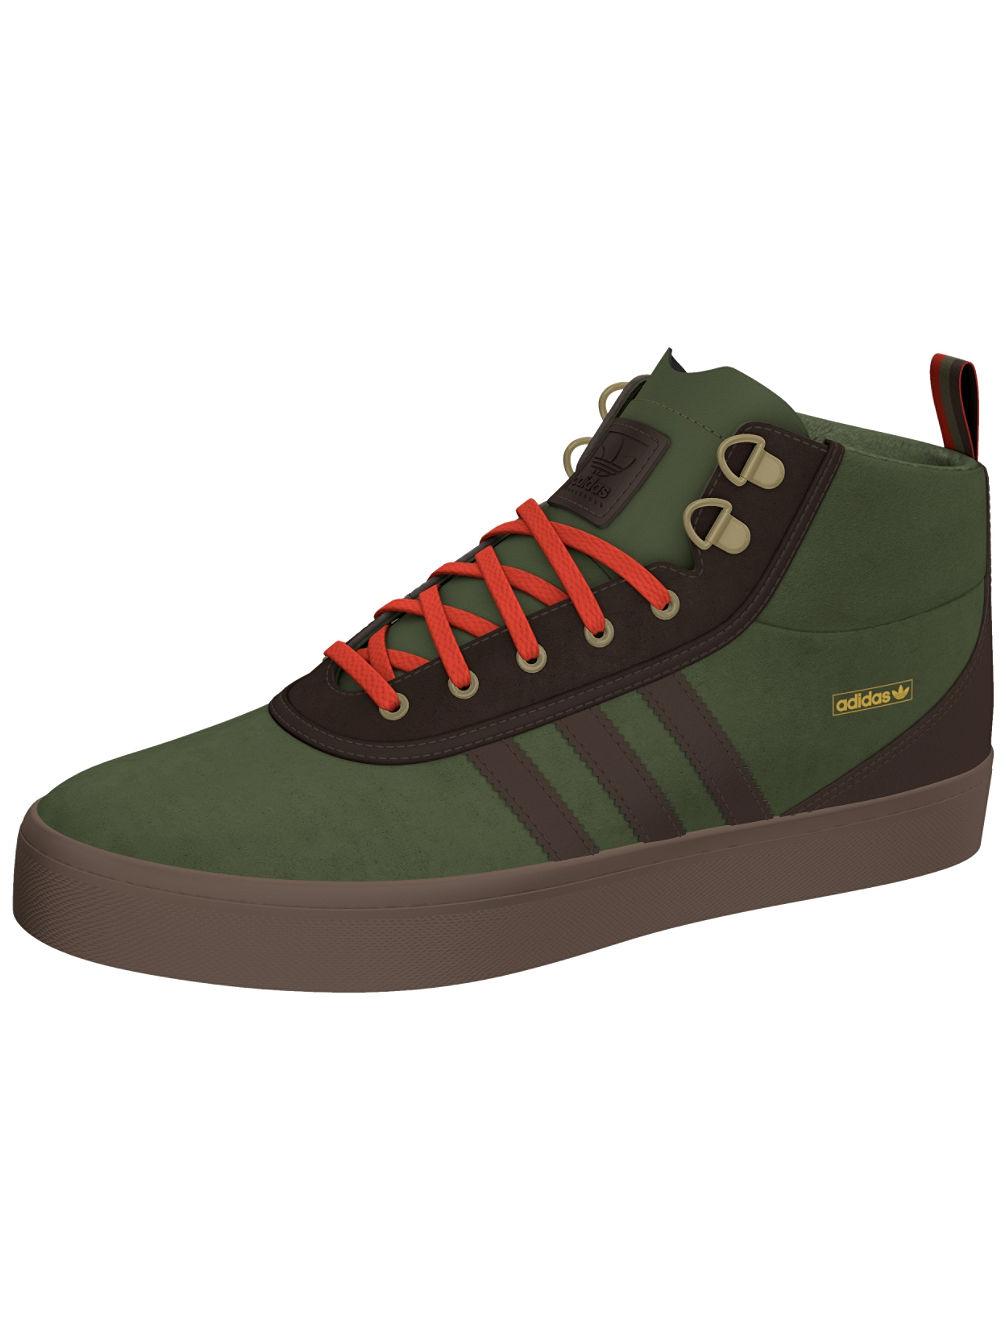 adidas-skateboarding-adi-trek-skate-shoes